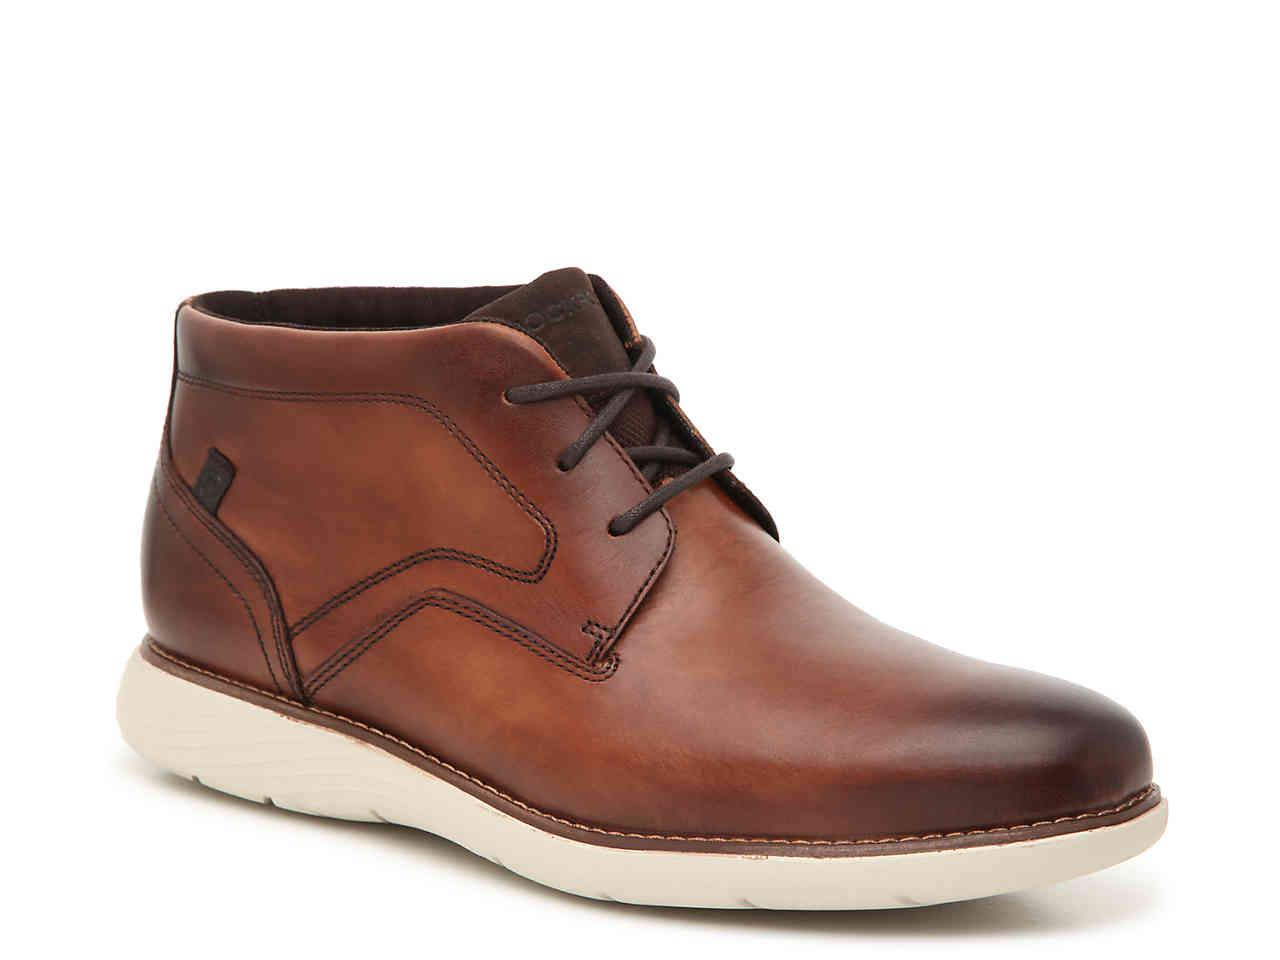 8694d233c0228 Lyst - Rockport Garett Chukka Boot in Brown for Men